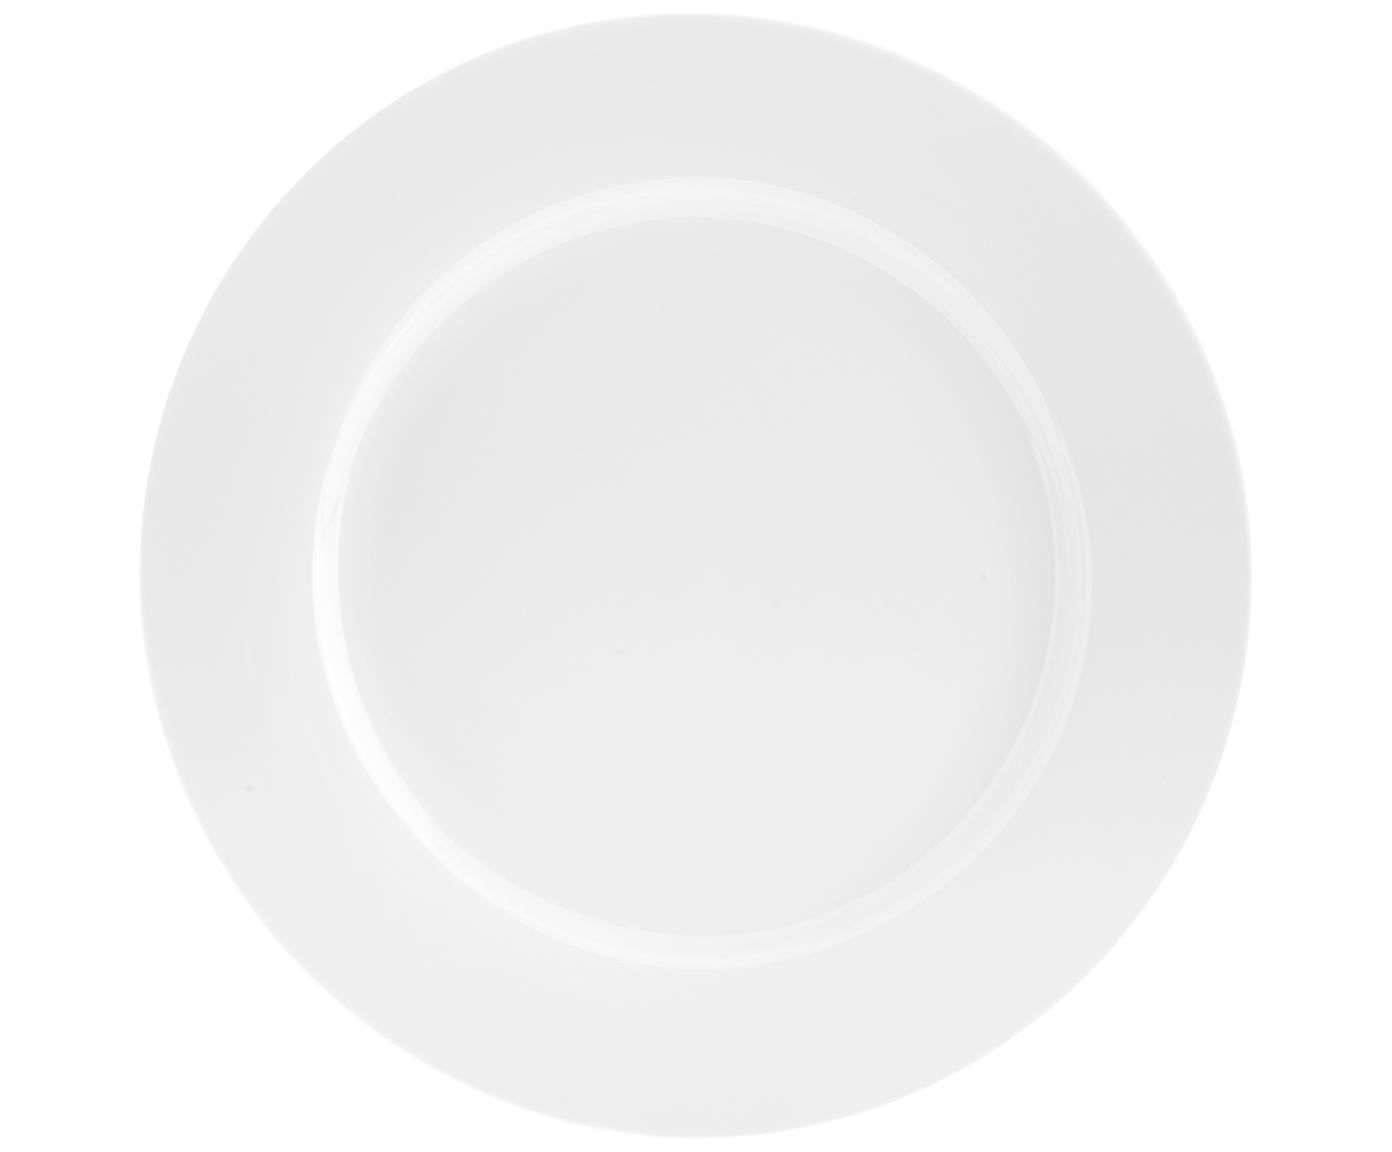 Dinerborden Delight Classic, 2 stuks, Porselein, Wit, Ø 27 cm